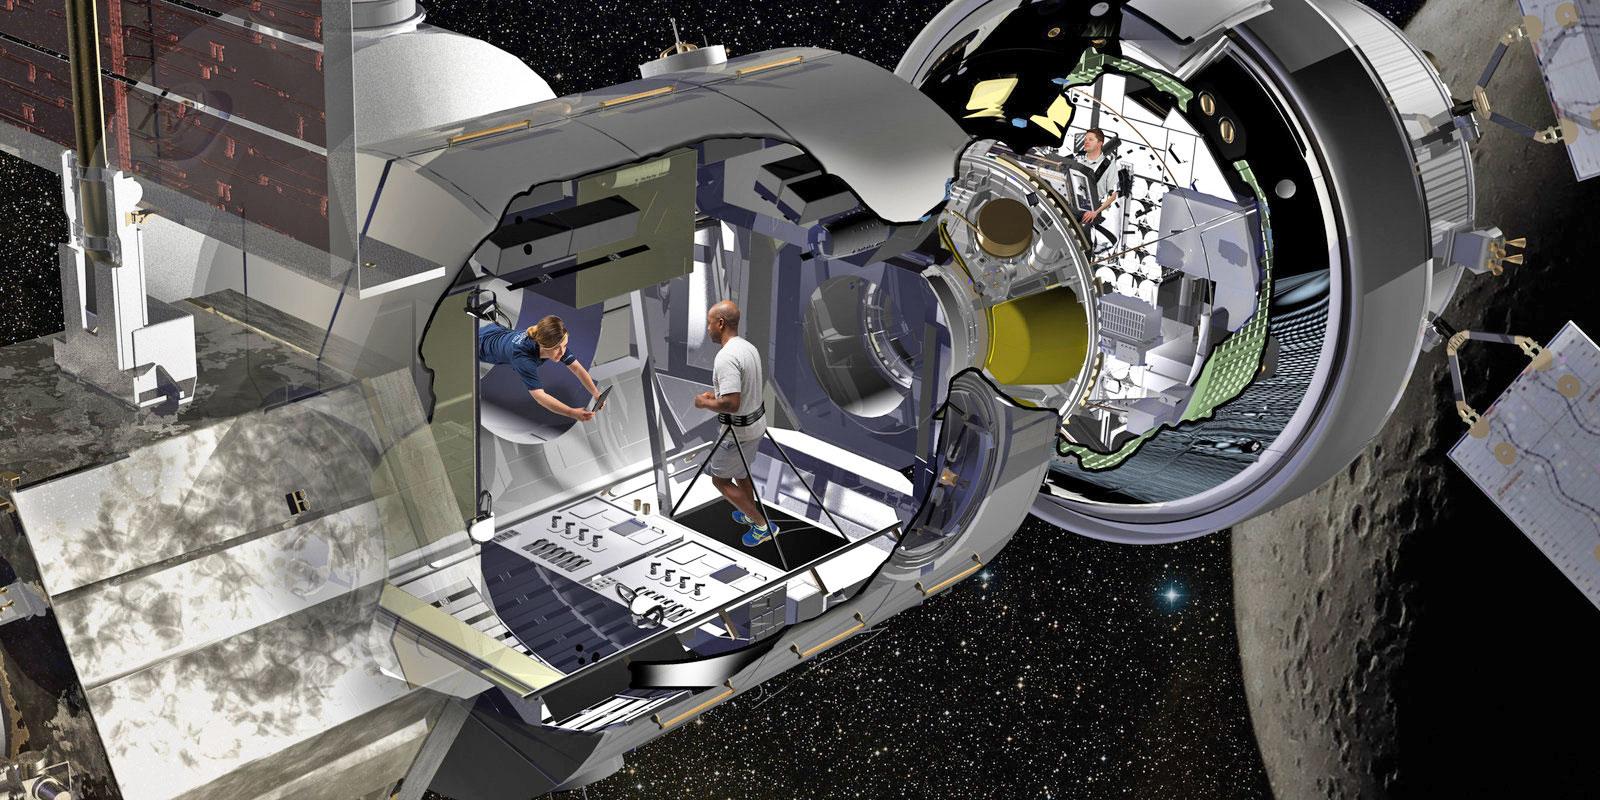 astronaut space habitat - photo #2